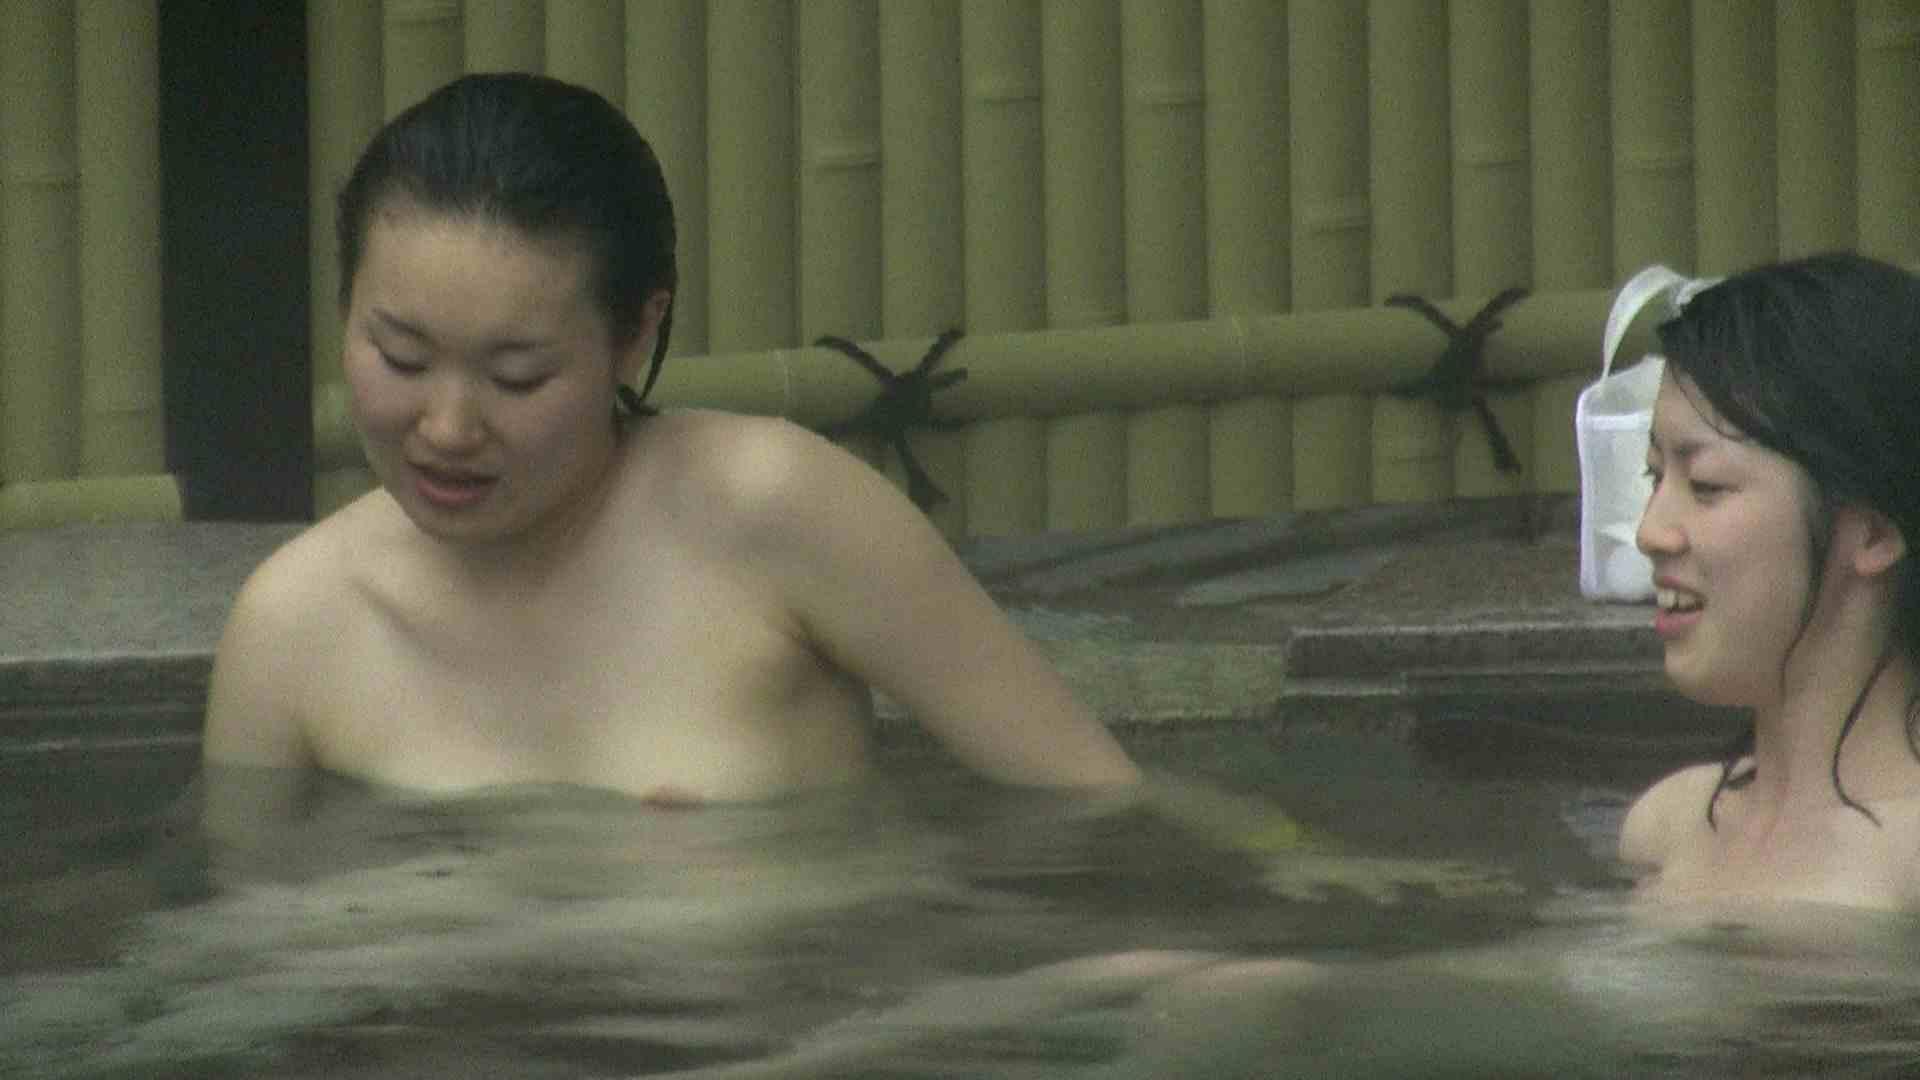 Aquaな露天風呂Vol.171 OLエロ画像 盗撮戯れ無修正画像 108PICs 29